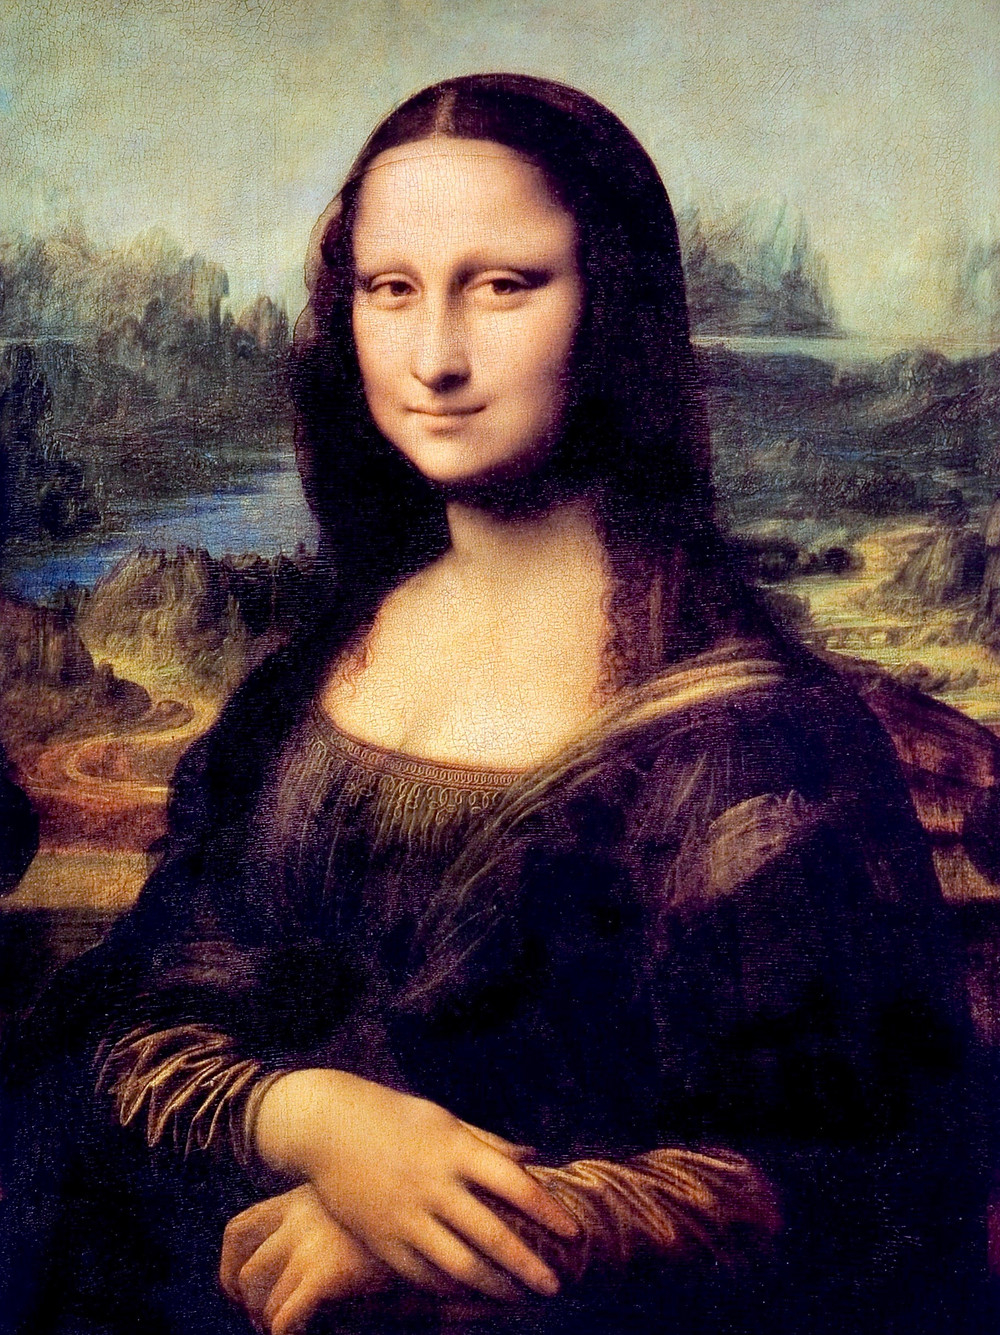 Leonardo da Vinci, Mona Lisa, 1503-19